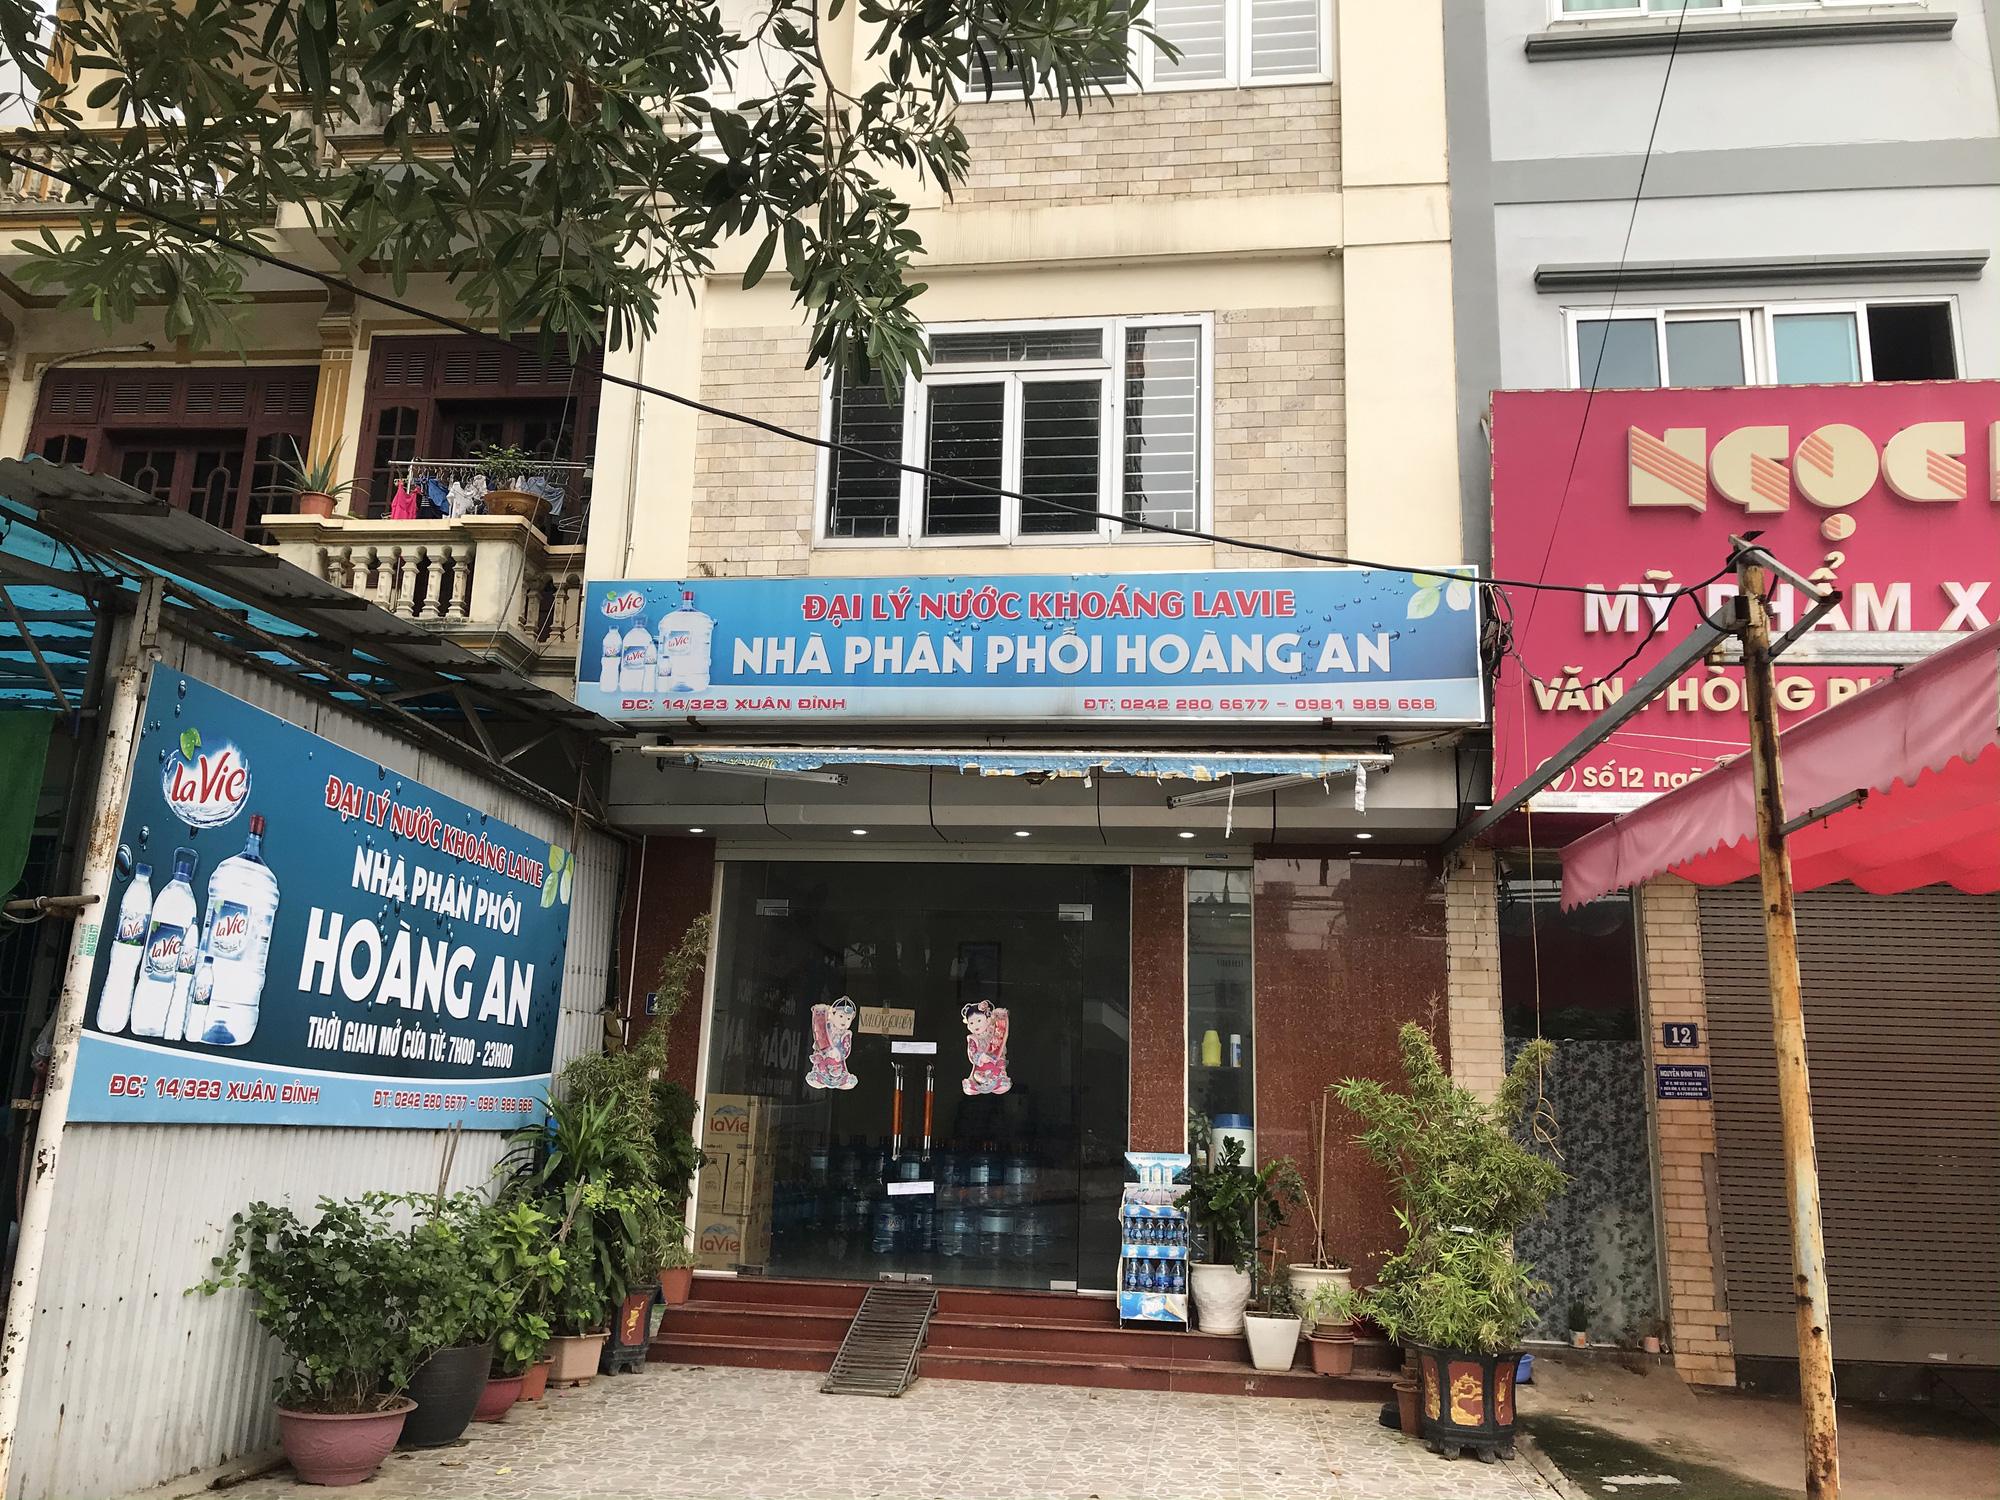 Father arrested for investigation into 6-yo daughter's unusual death in Hanoi